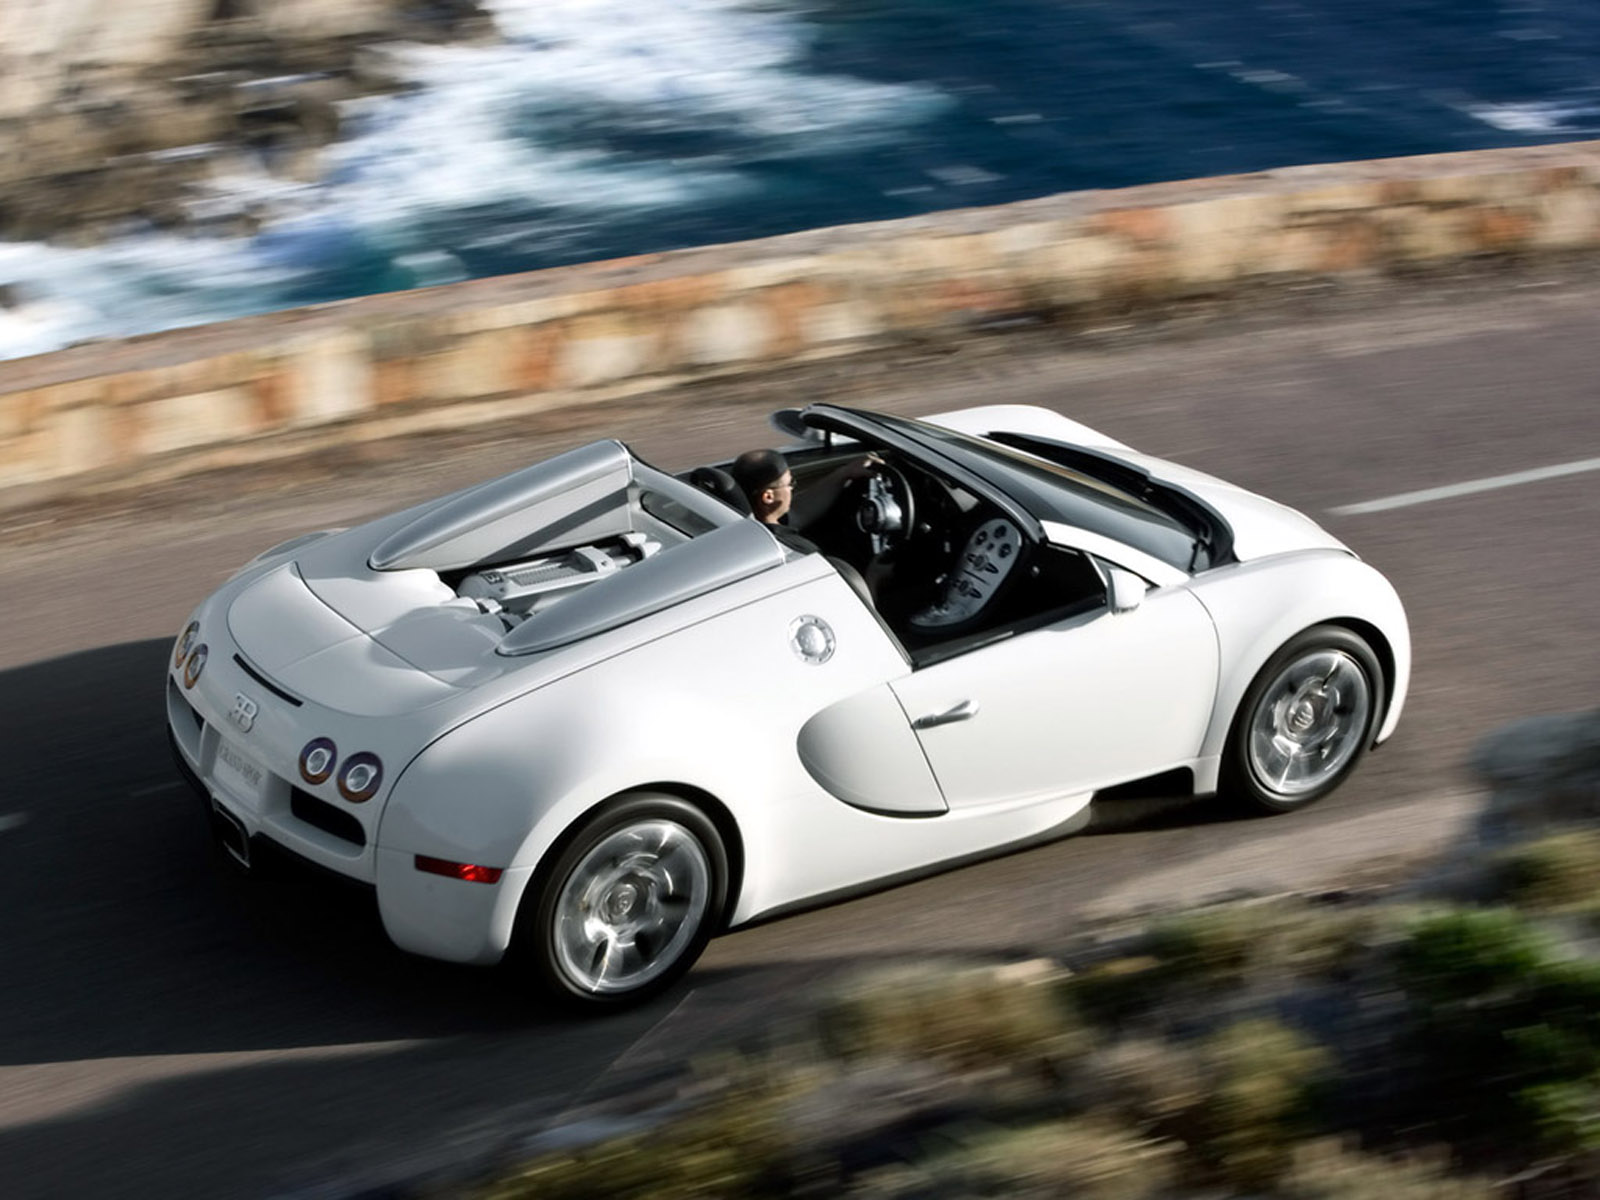 http://2.bp.blogspot.com/-P2qALplaptA/Tfg40lJhWeI/AAAAAAAABh8/y6AbgLAQST4/s1600/bugatti-164-veyron-grand-sport.jpg